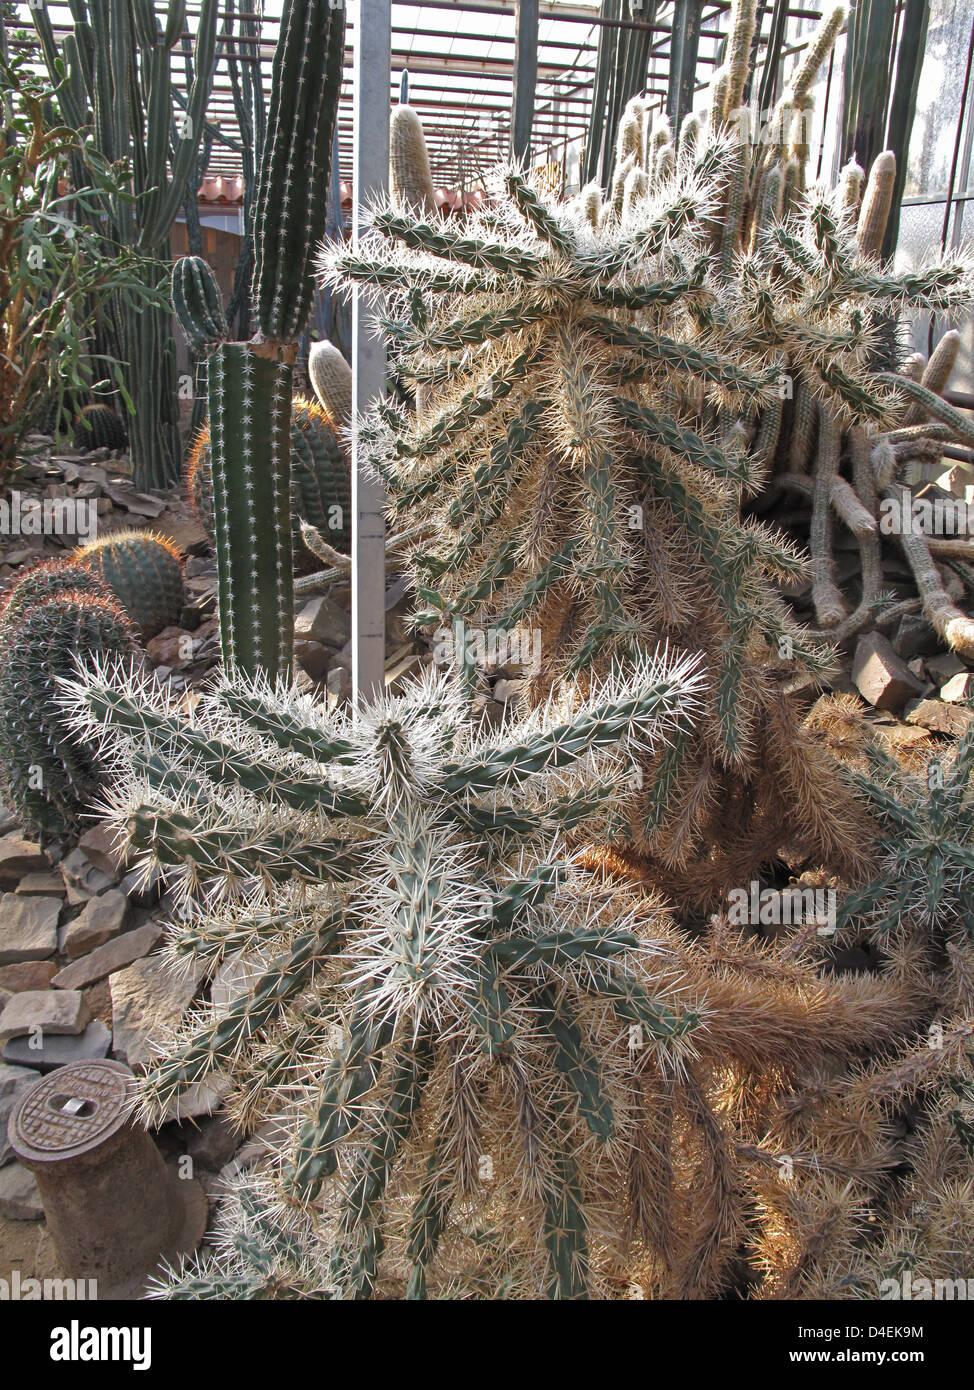 Cylindrica Opuntia. Opuntia tunicata. Stock Photo